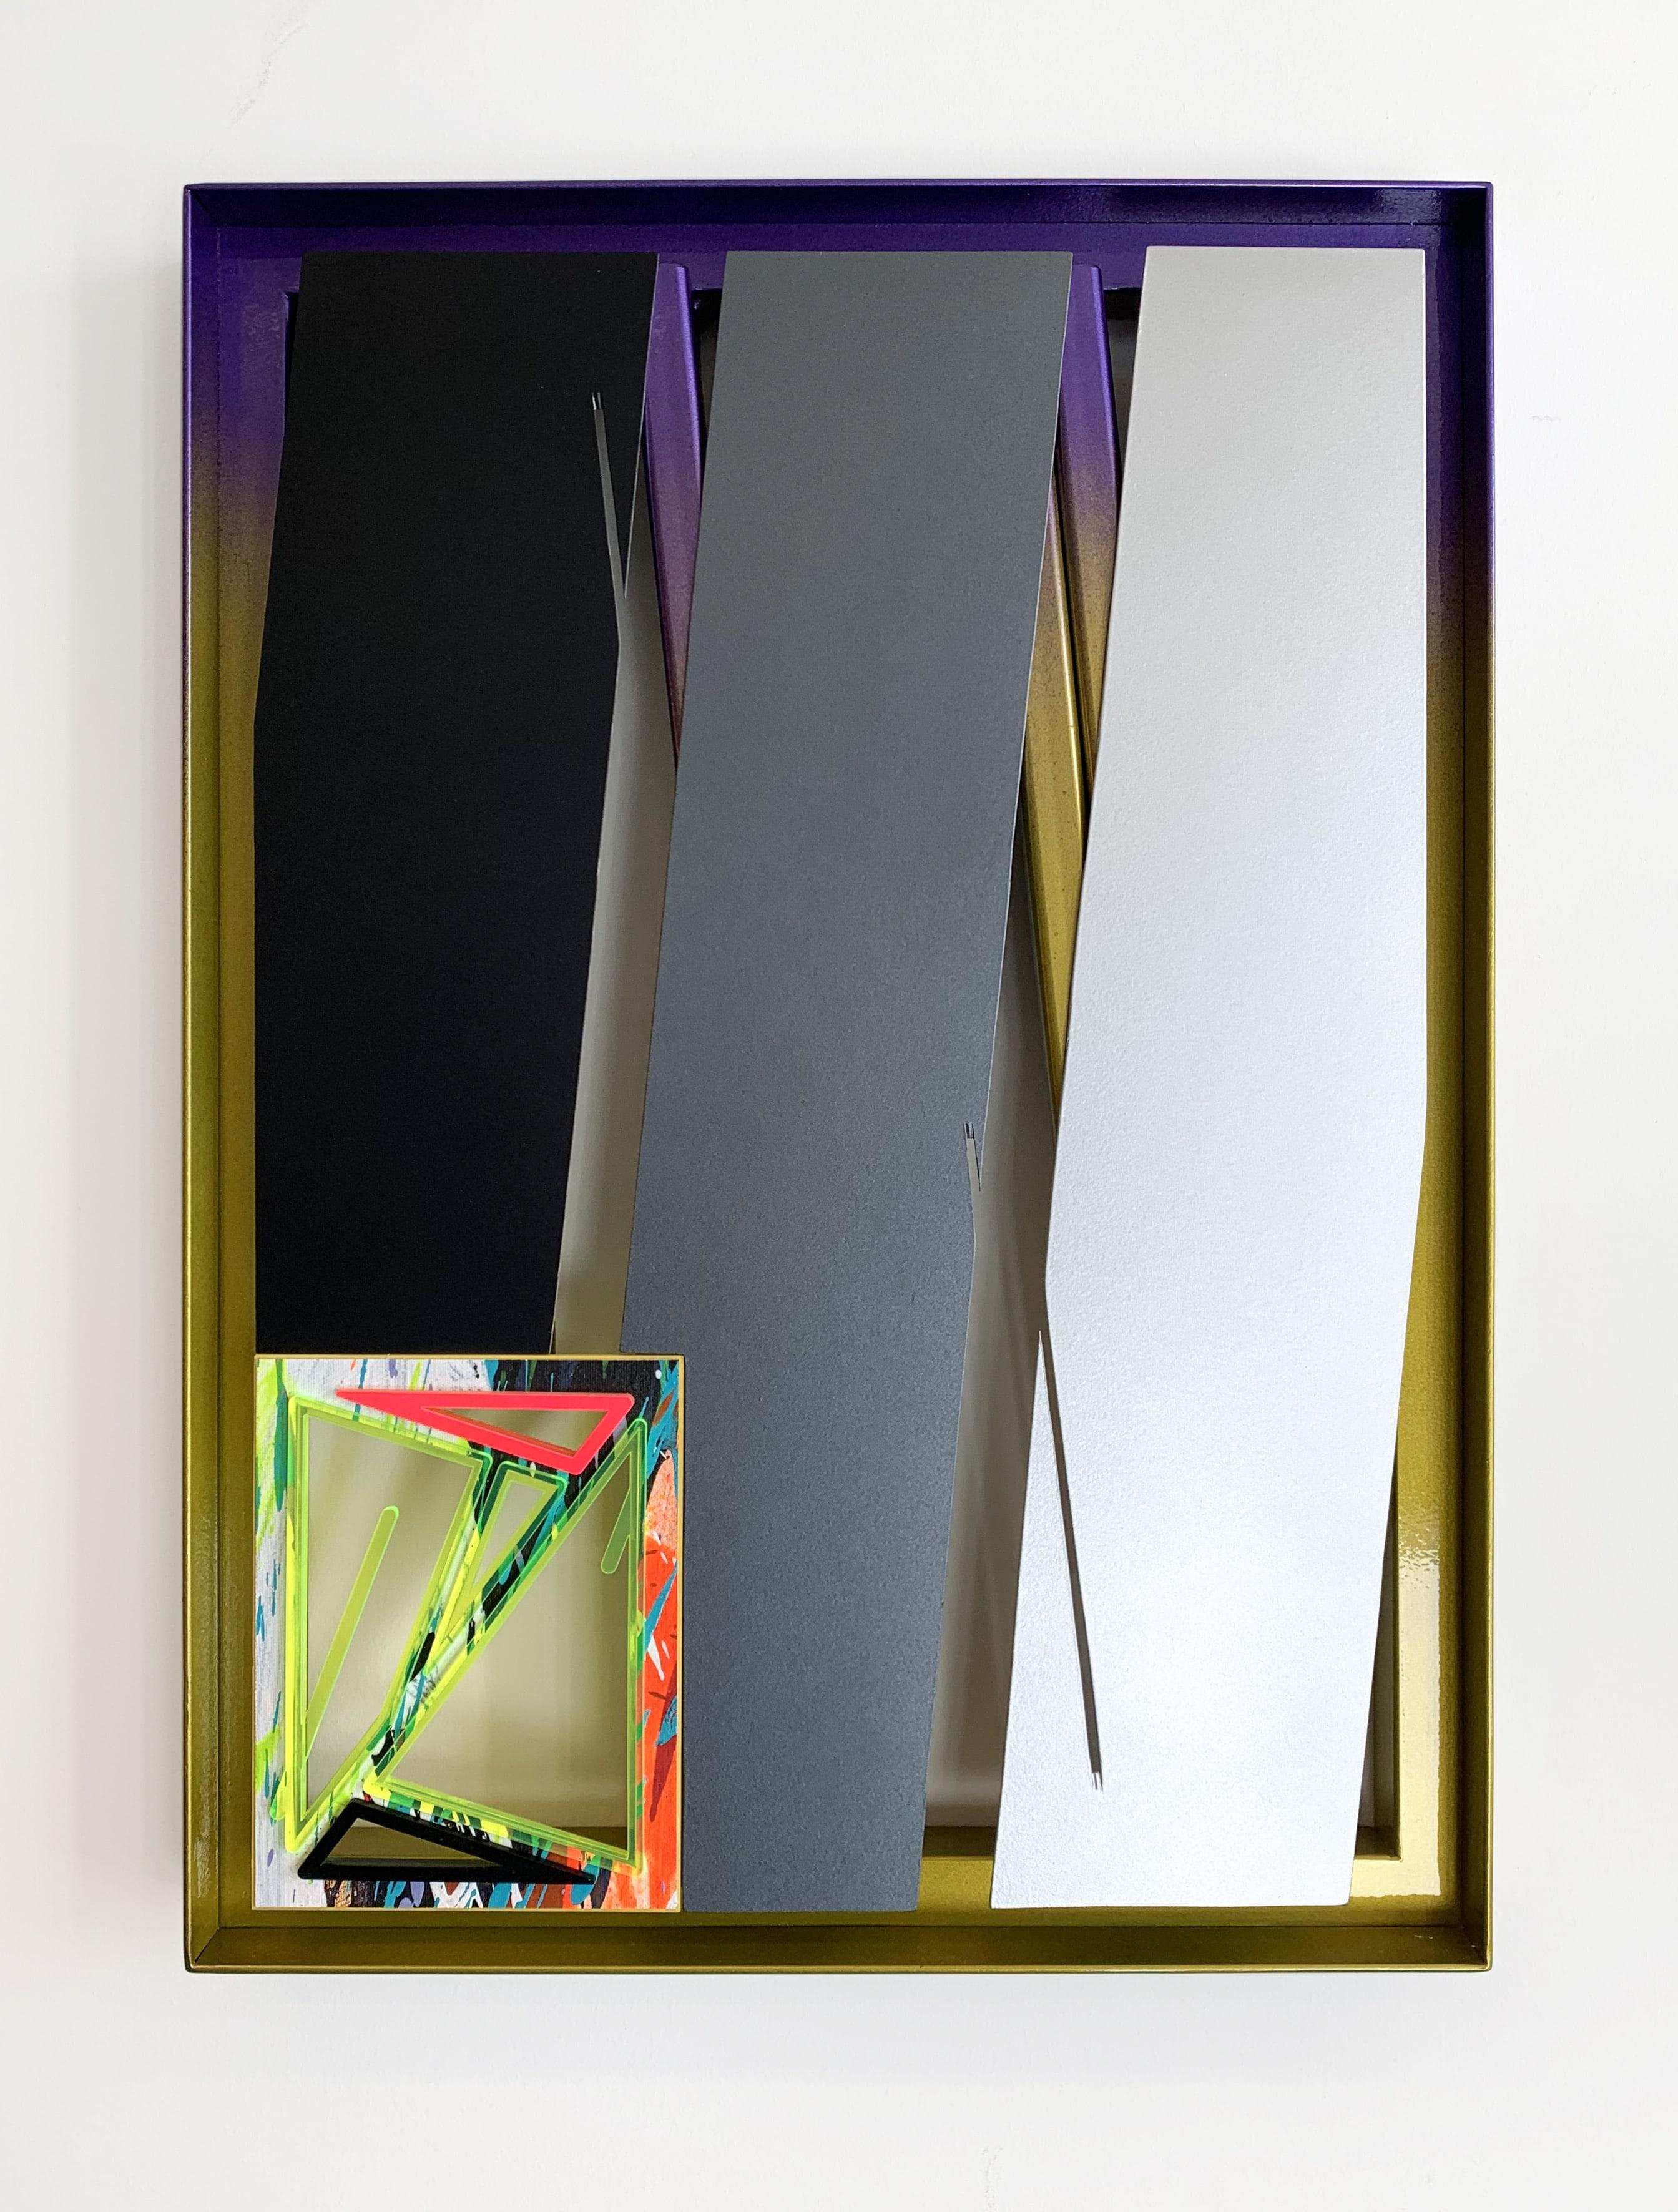 NemesM_The-Better-Self-12_2020_55x40cm_steel-aluminium-carpaint-lasercut-perspex-acrilyc-mirror-board-min